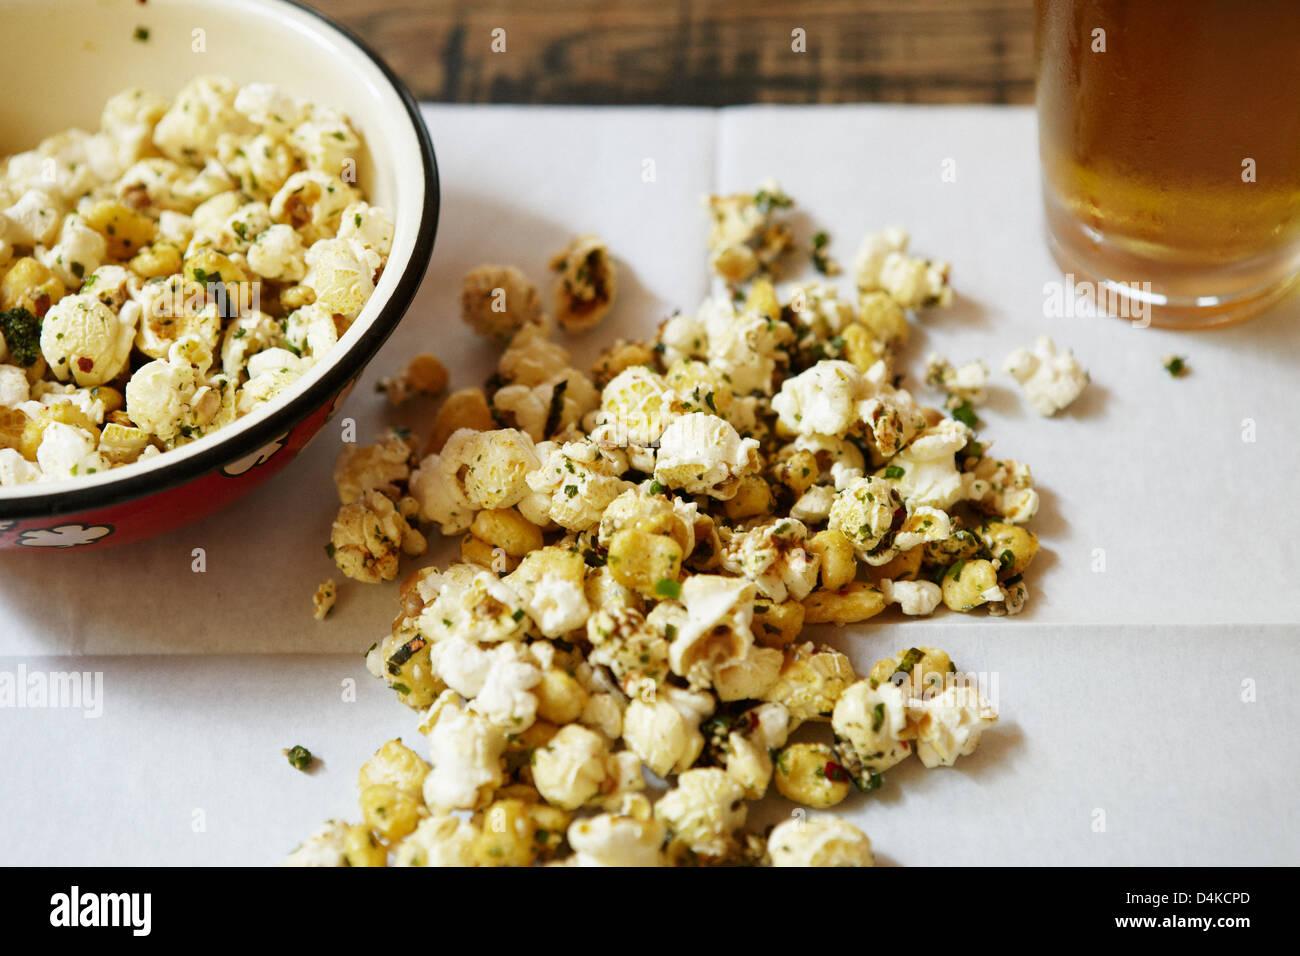 Popcorn on napkin on table - Stock Image